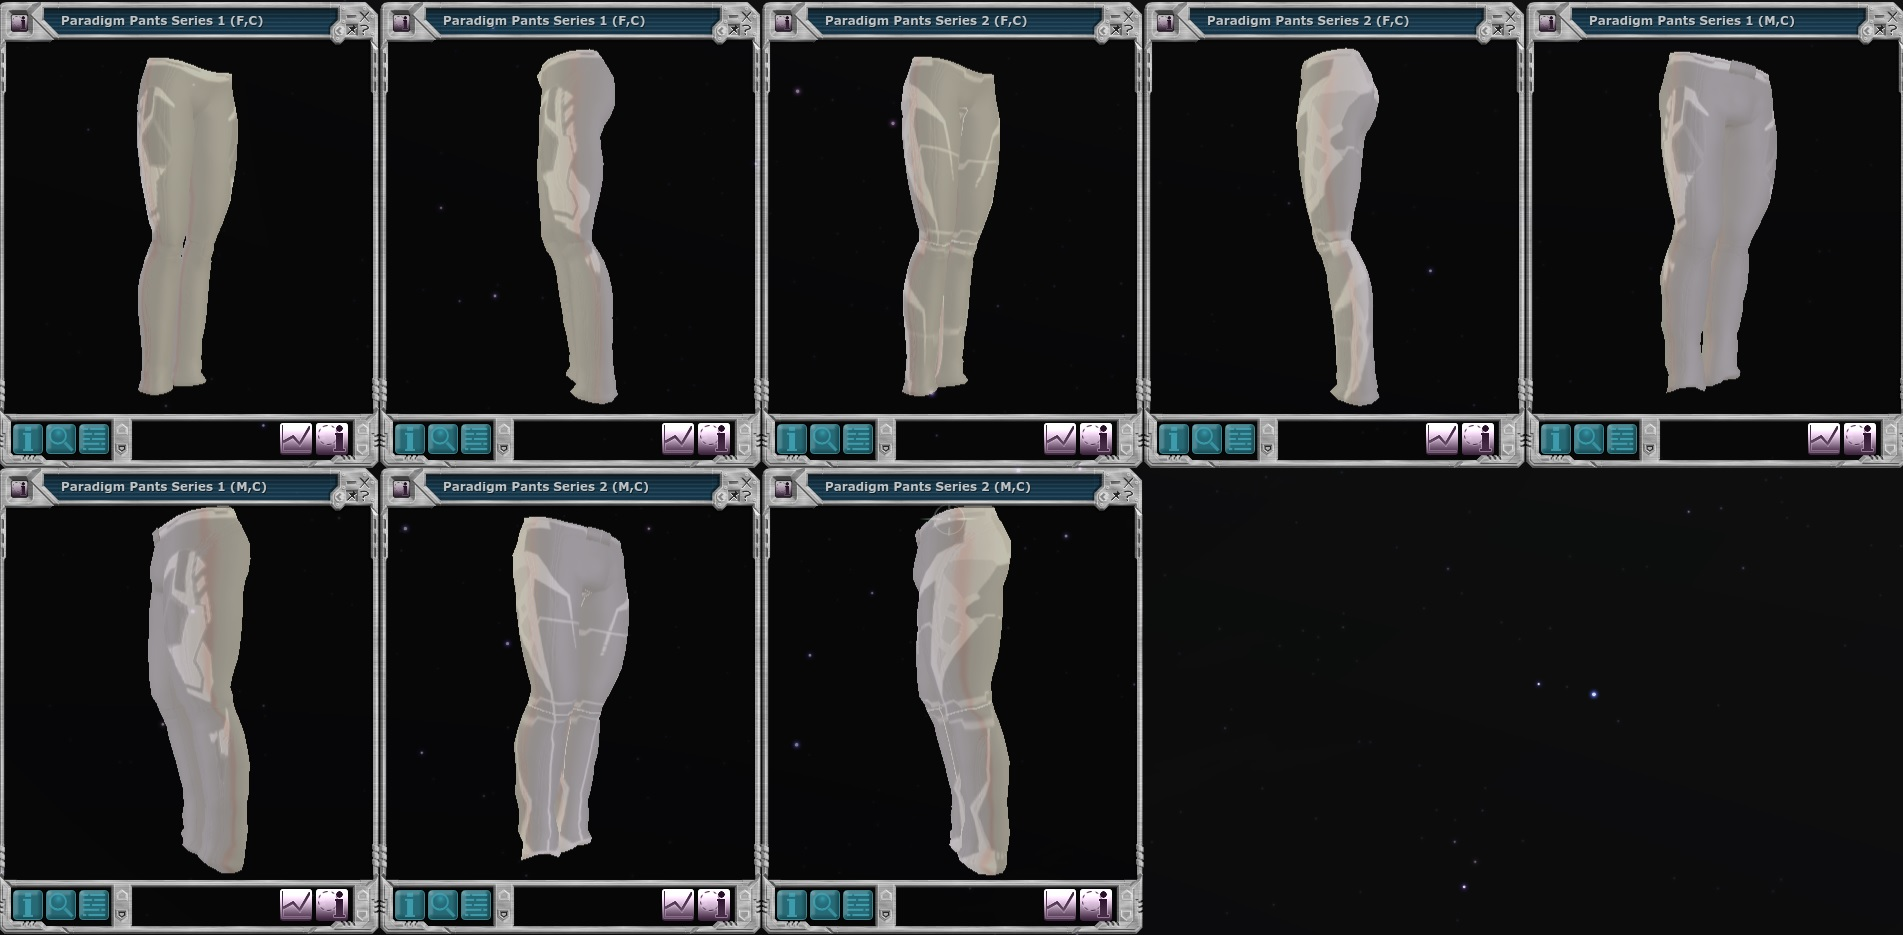 Paradigm Pants.jpg